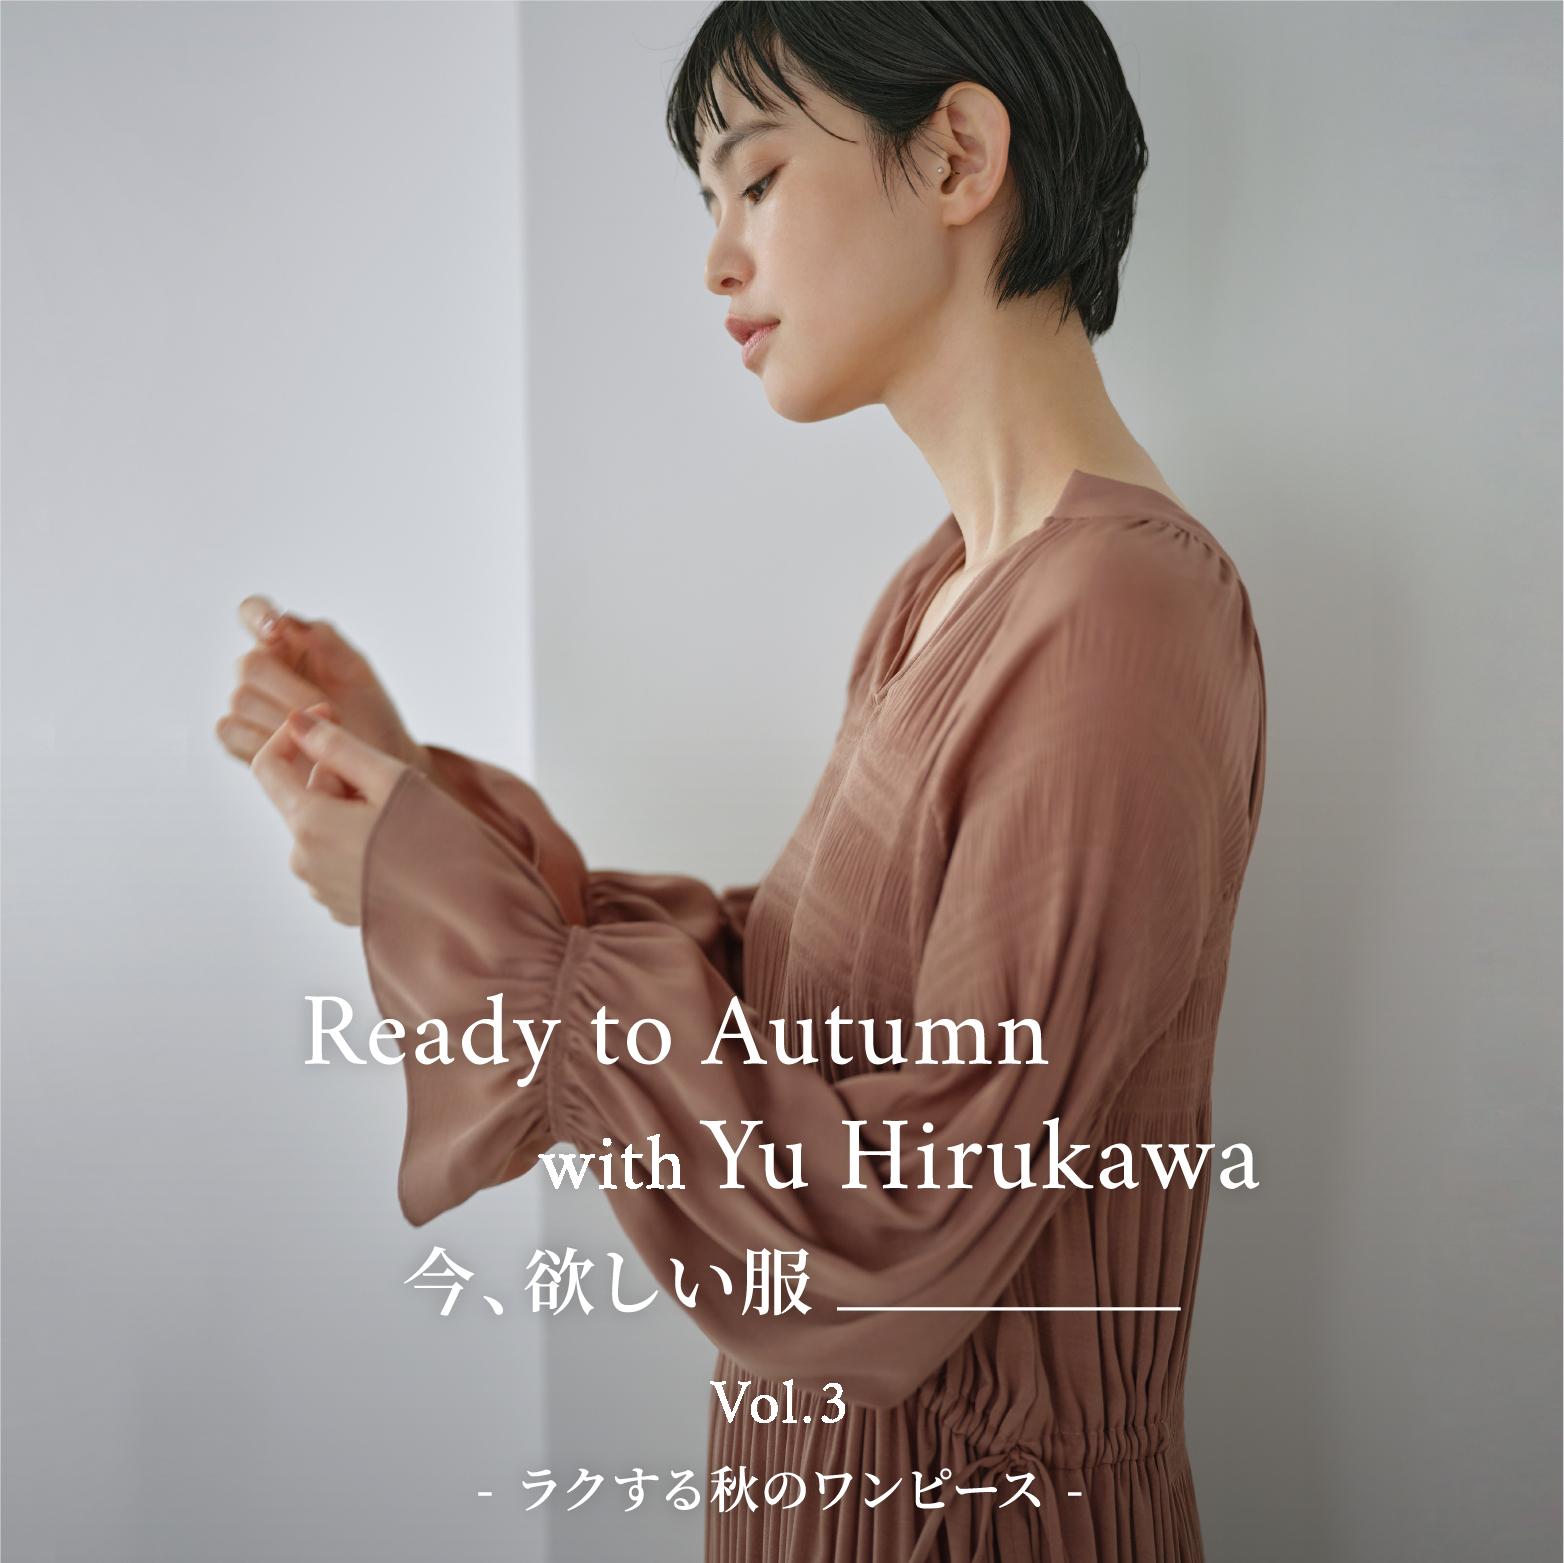 Ready to Autumn with Yu Hirukawa 今、欲しい服 Vol.3 - ラクする秋のワンピース -